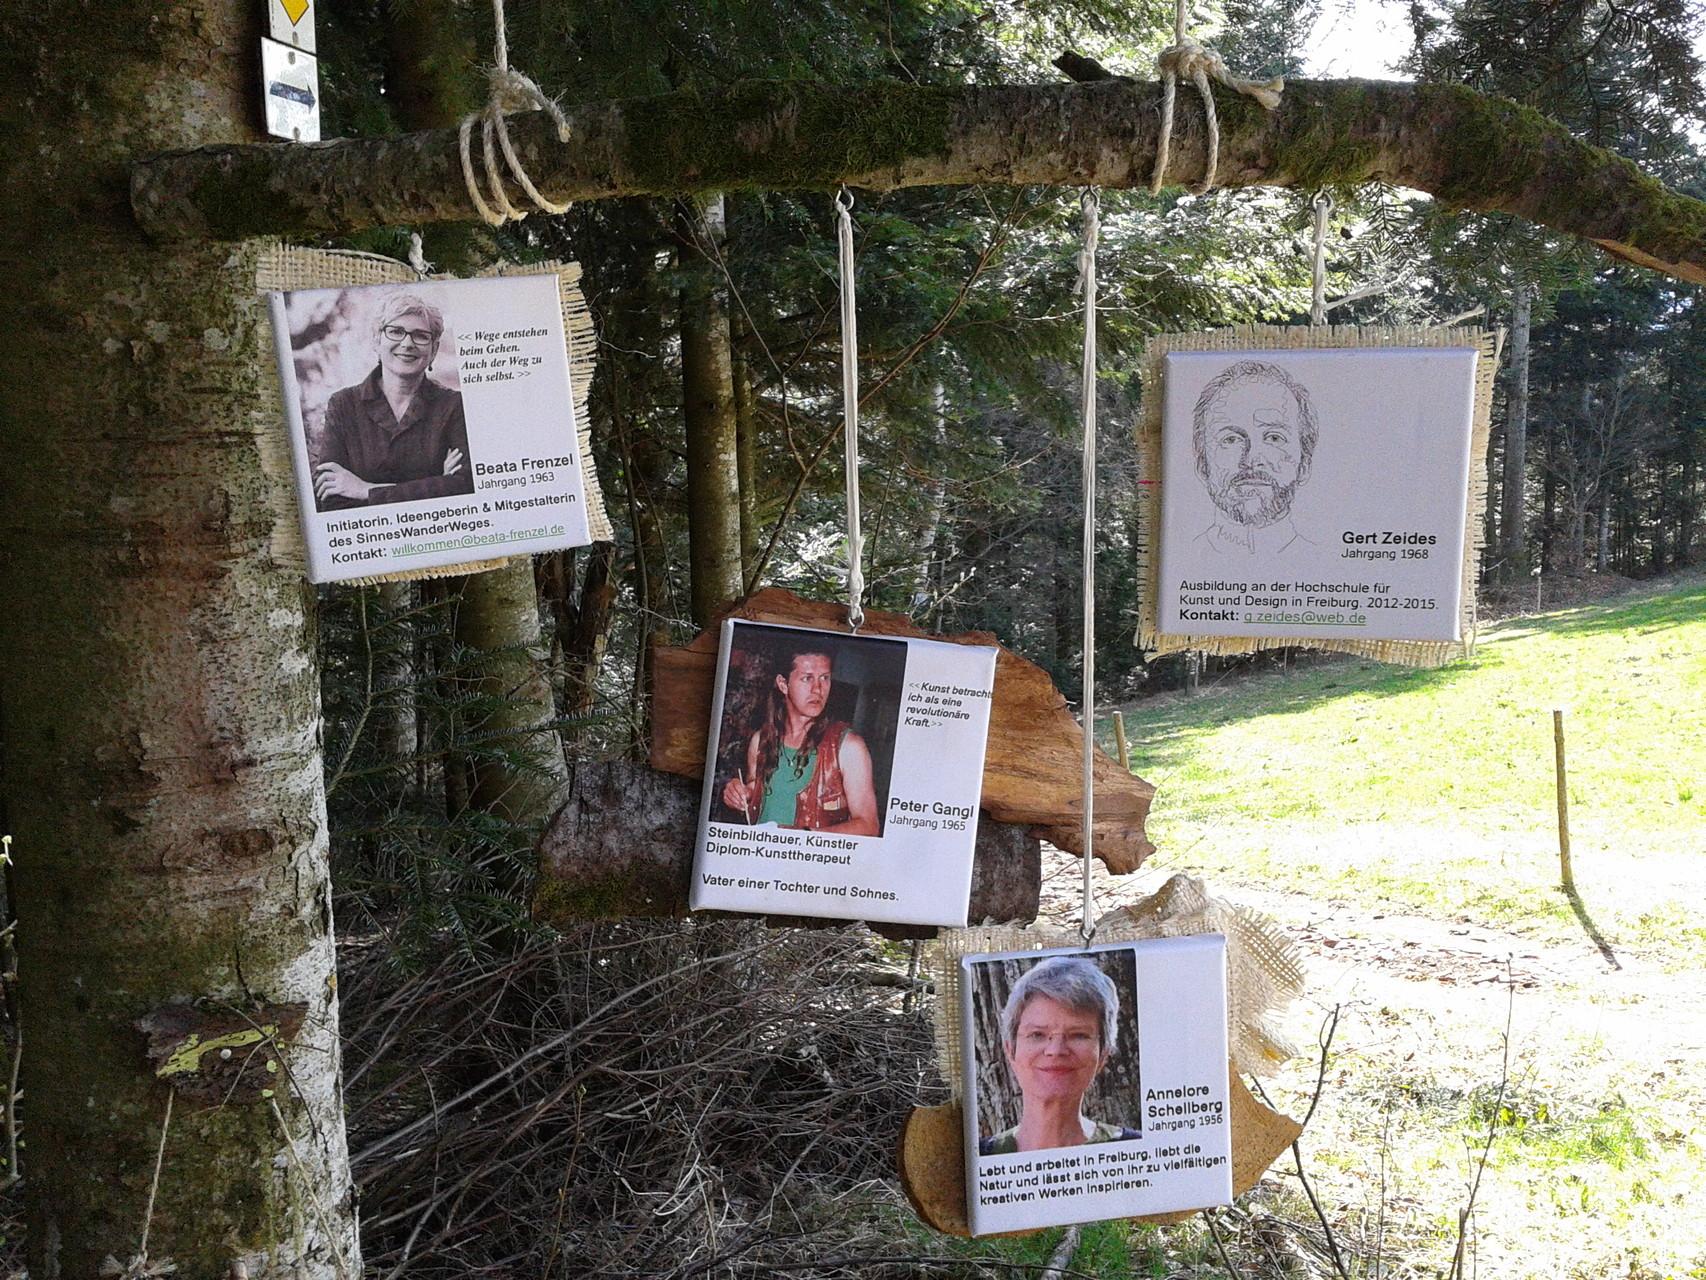 Die kreativen Köpfe: Annelore Schellberg, Peter Gangl, Gert Zeides, Beata Frenzel